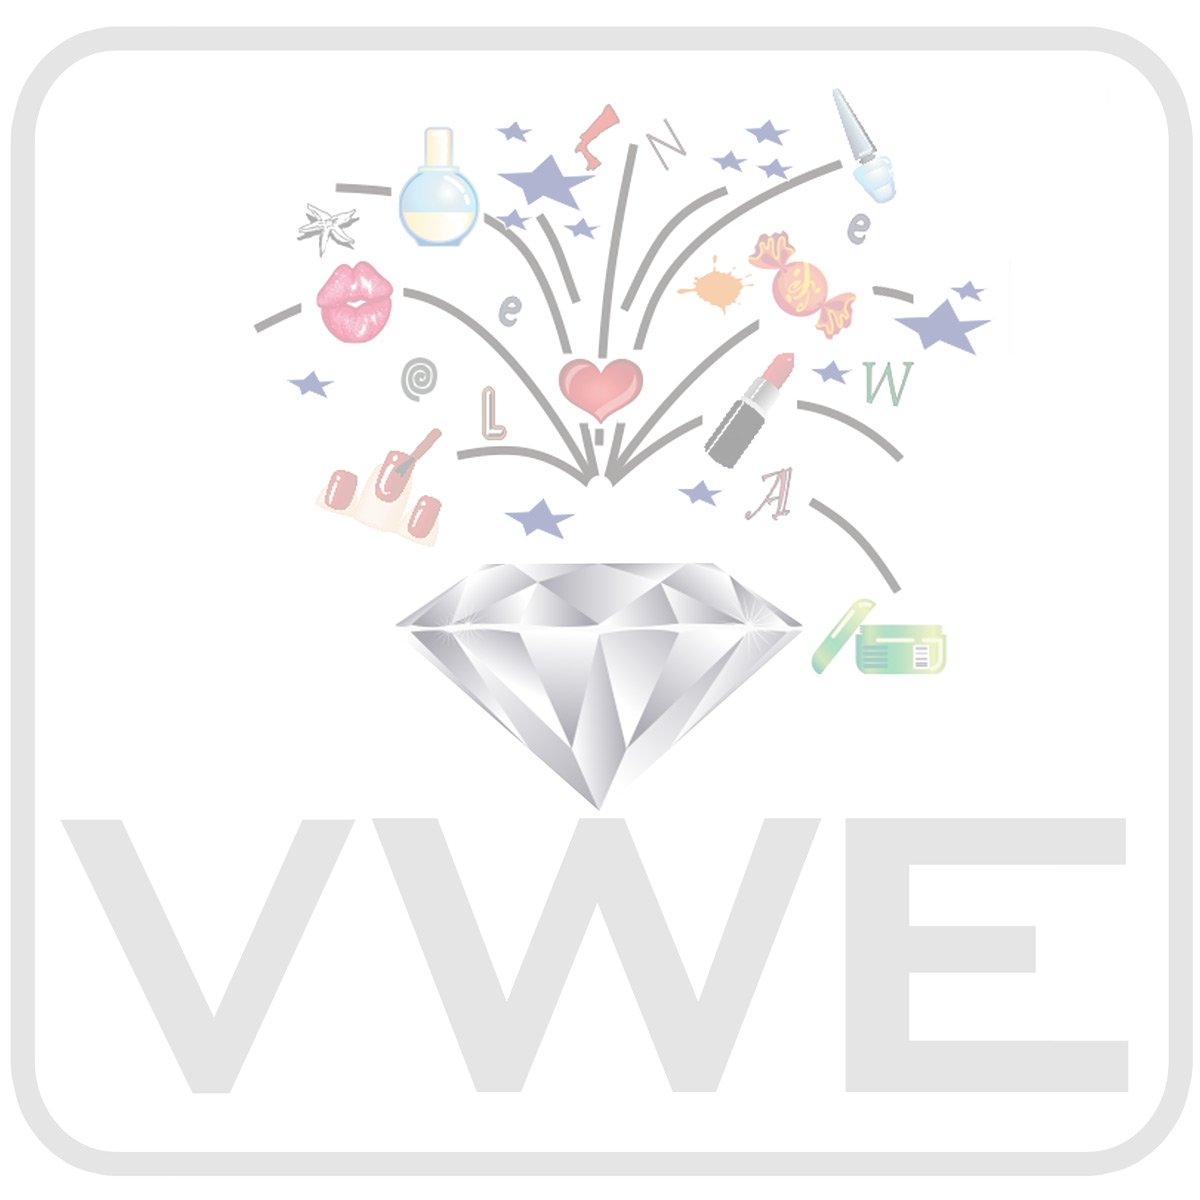 UV Gel Flux Diamond Touch - GFDT15-XS - 5ml  [1 / 3]